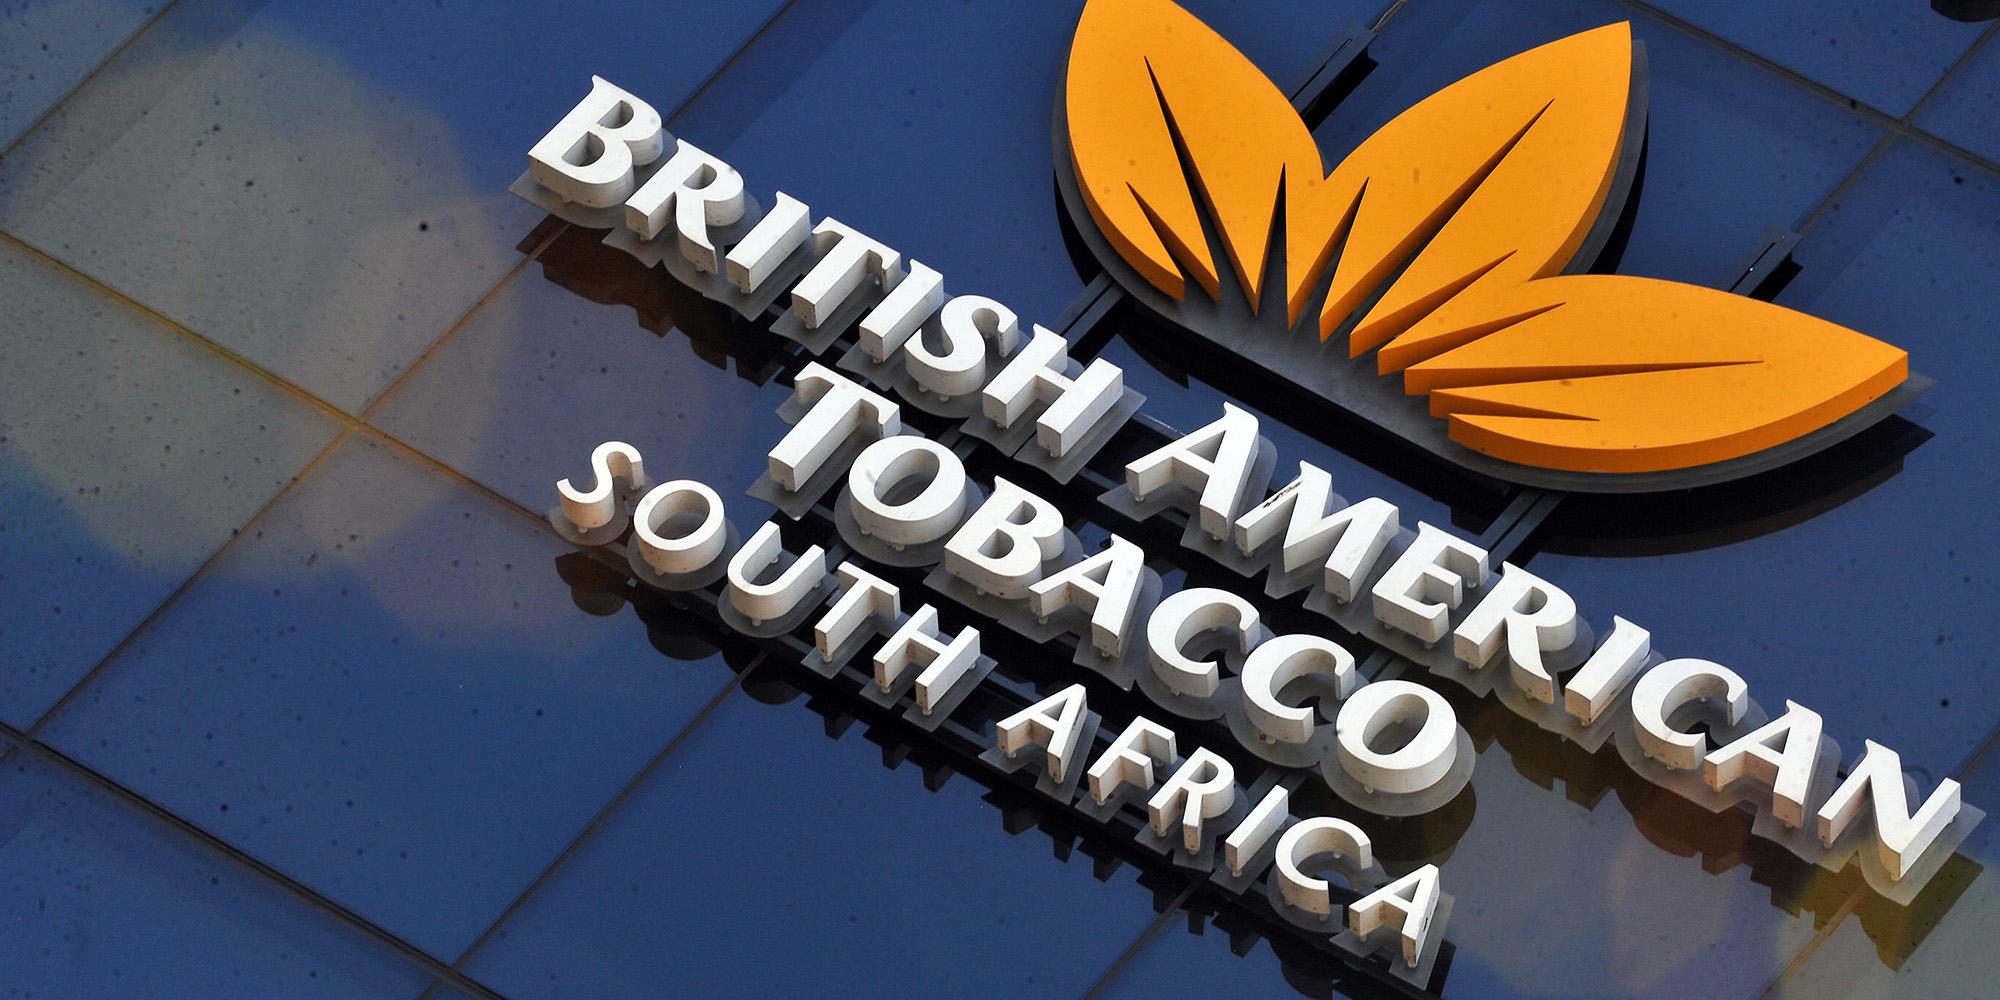 Tobacco giants BATSA and JTI head to court over tobacco ban - Daily Maverick